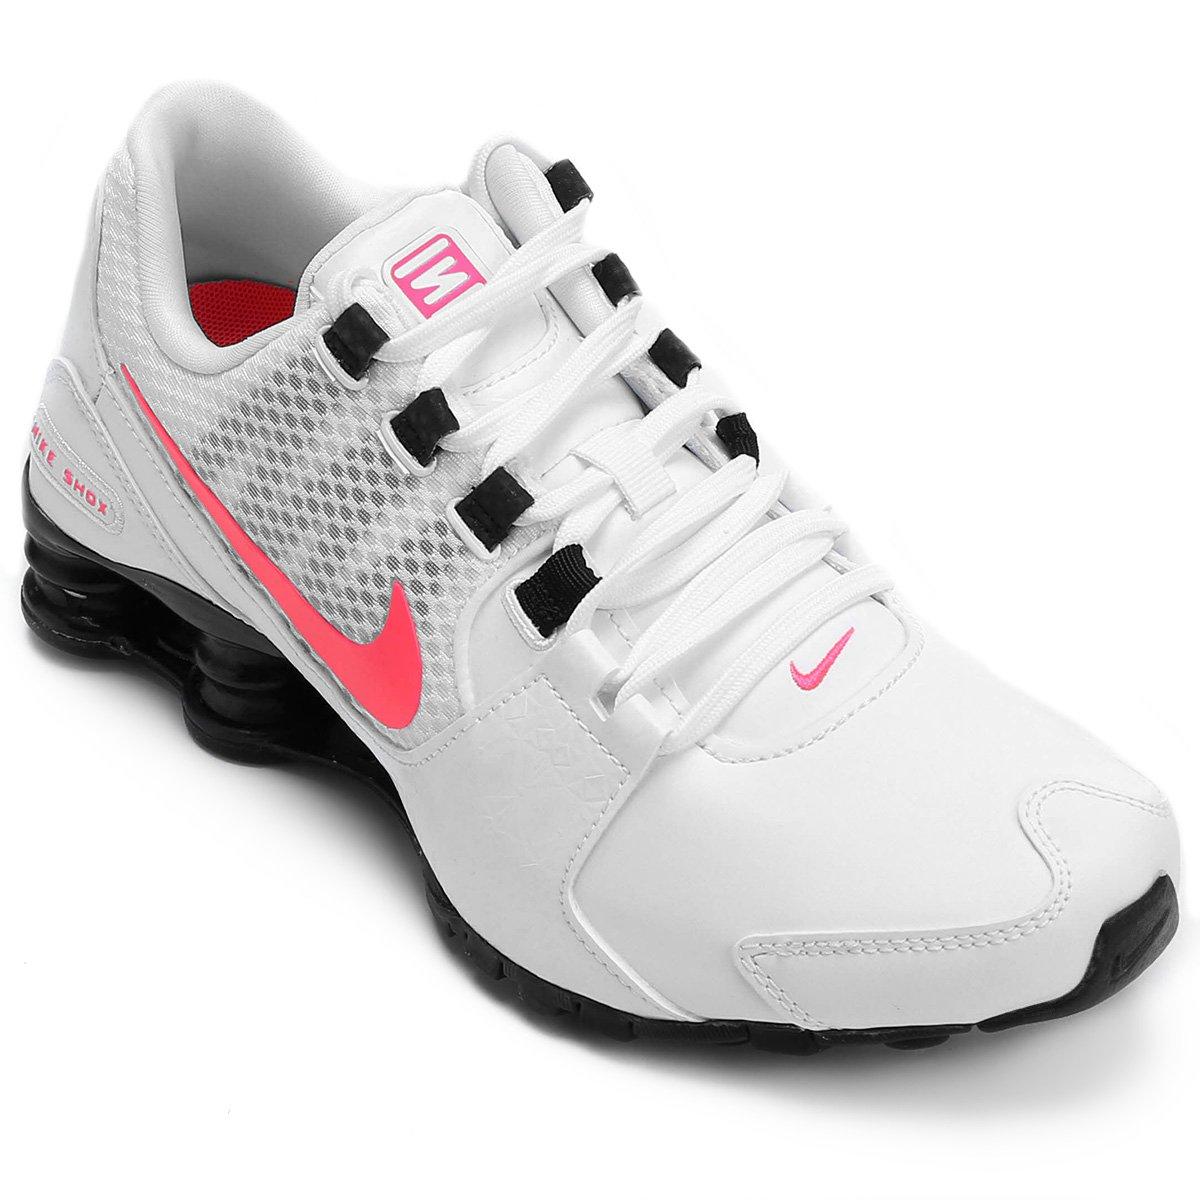 b1d44425cbb Carregando zoom. Tênis Nike Shox Avenue Se Feminino - Branco ...